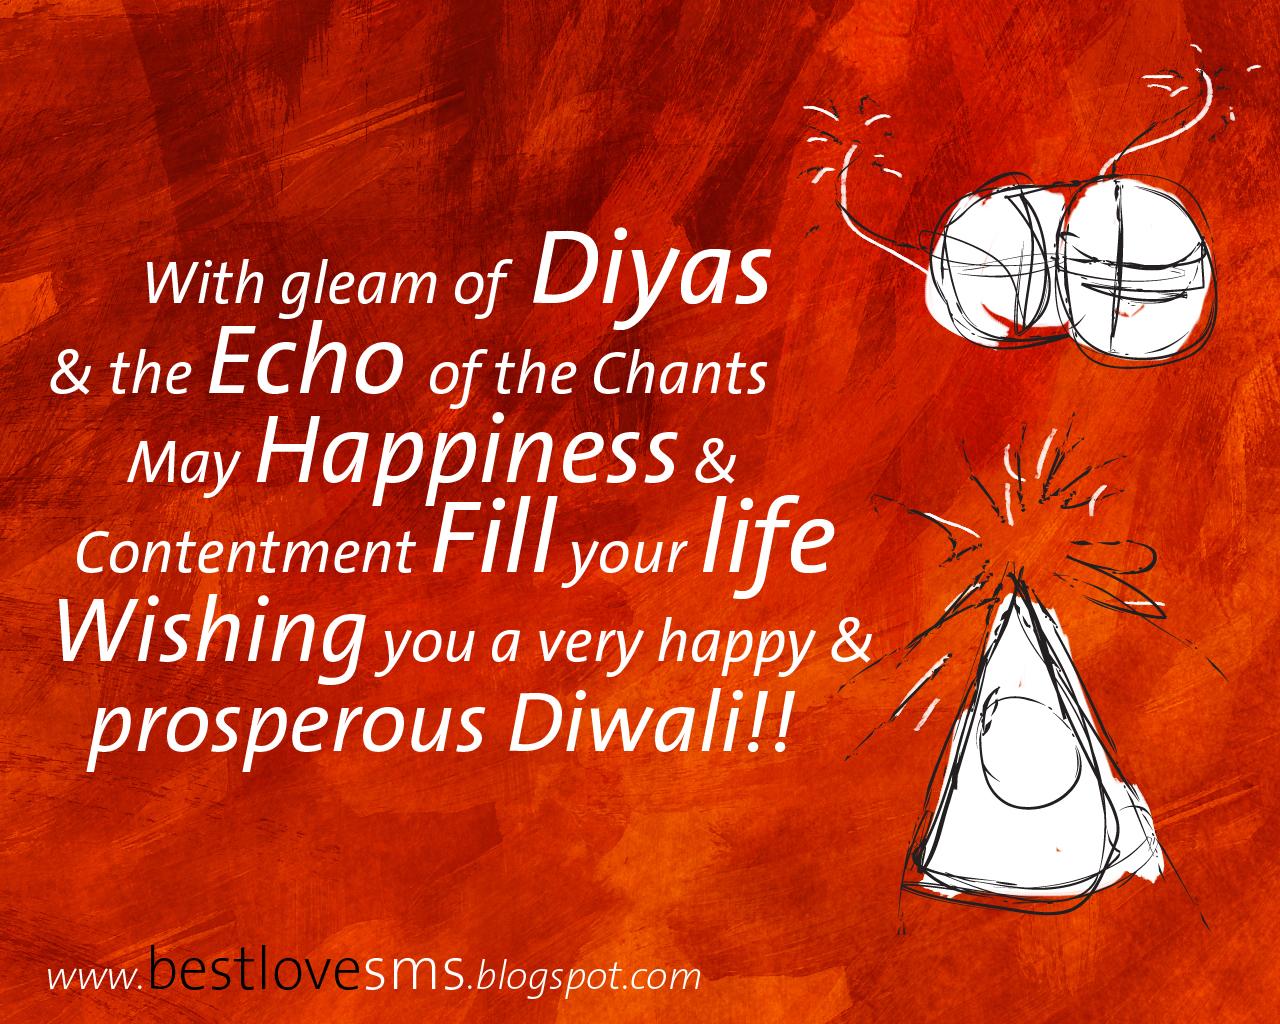 1280x1024px message wallpaper wallpapersafari happy diwali tihar messages wallpapers greetings 1280x1024 m4hsunfo